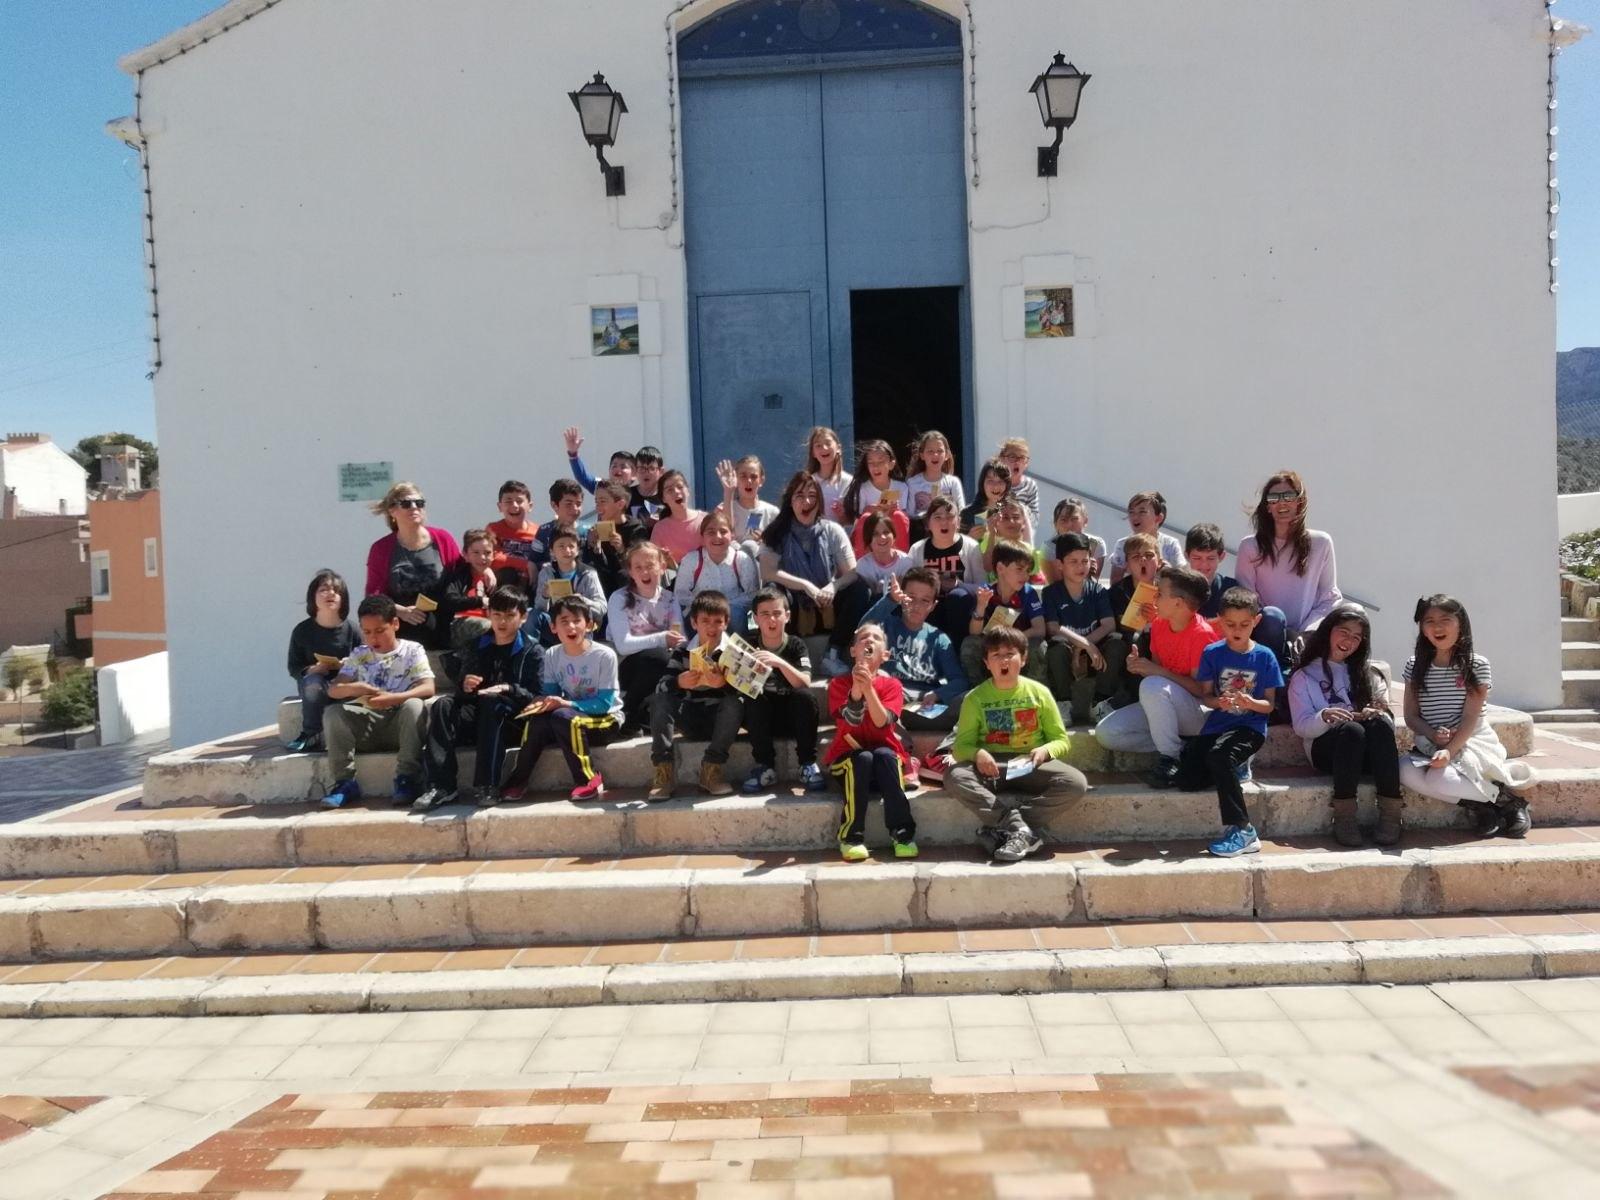 (2018-04-18) - Visita ermita alumnos Beatriz-Carmina-Lucía,3º,La Foia - María Isabel Berenguer Brotons - (07)